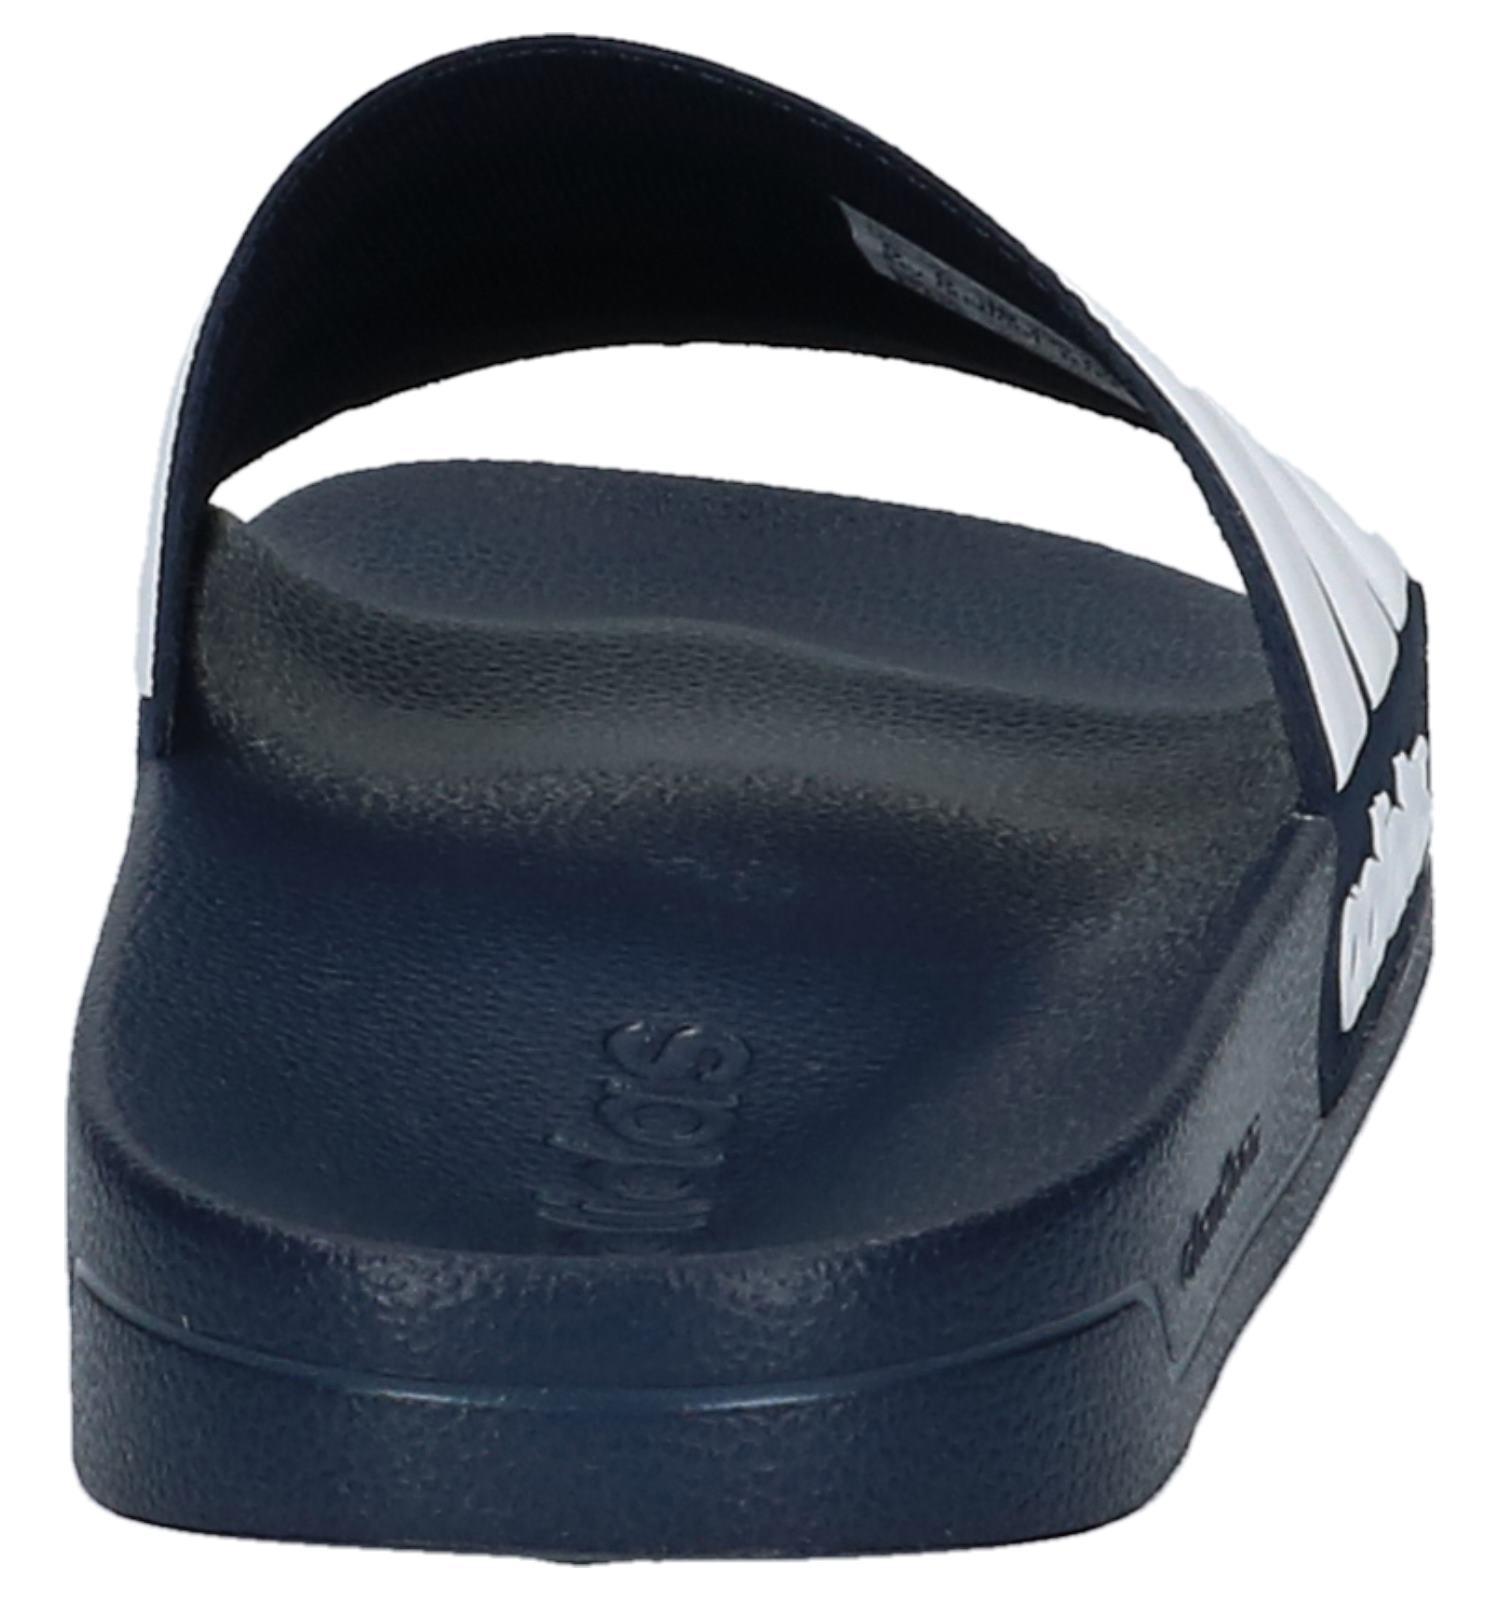 e7789e09441 Donkerblauwe Badslippers adidas Cloudfoam Adilette | TORFS.BE | Gratis  verzend en retour